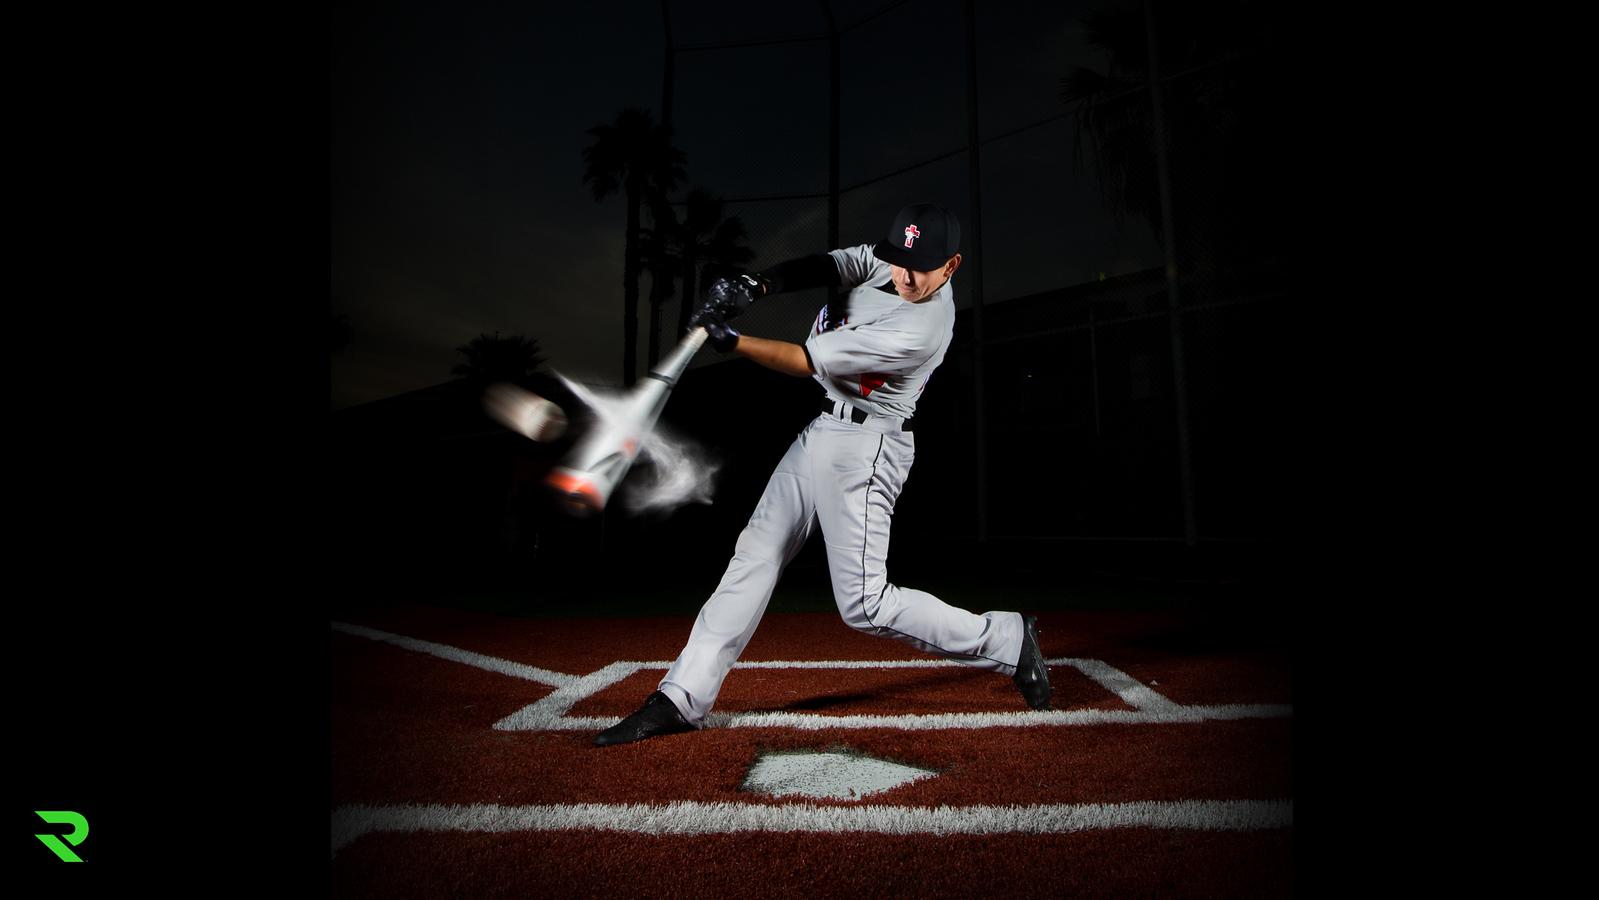 SFC Baseball